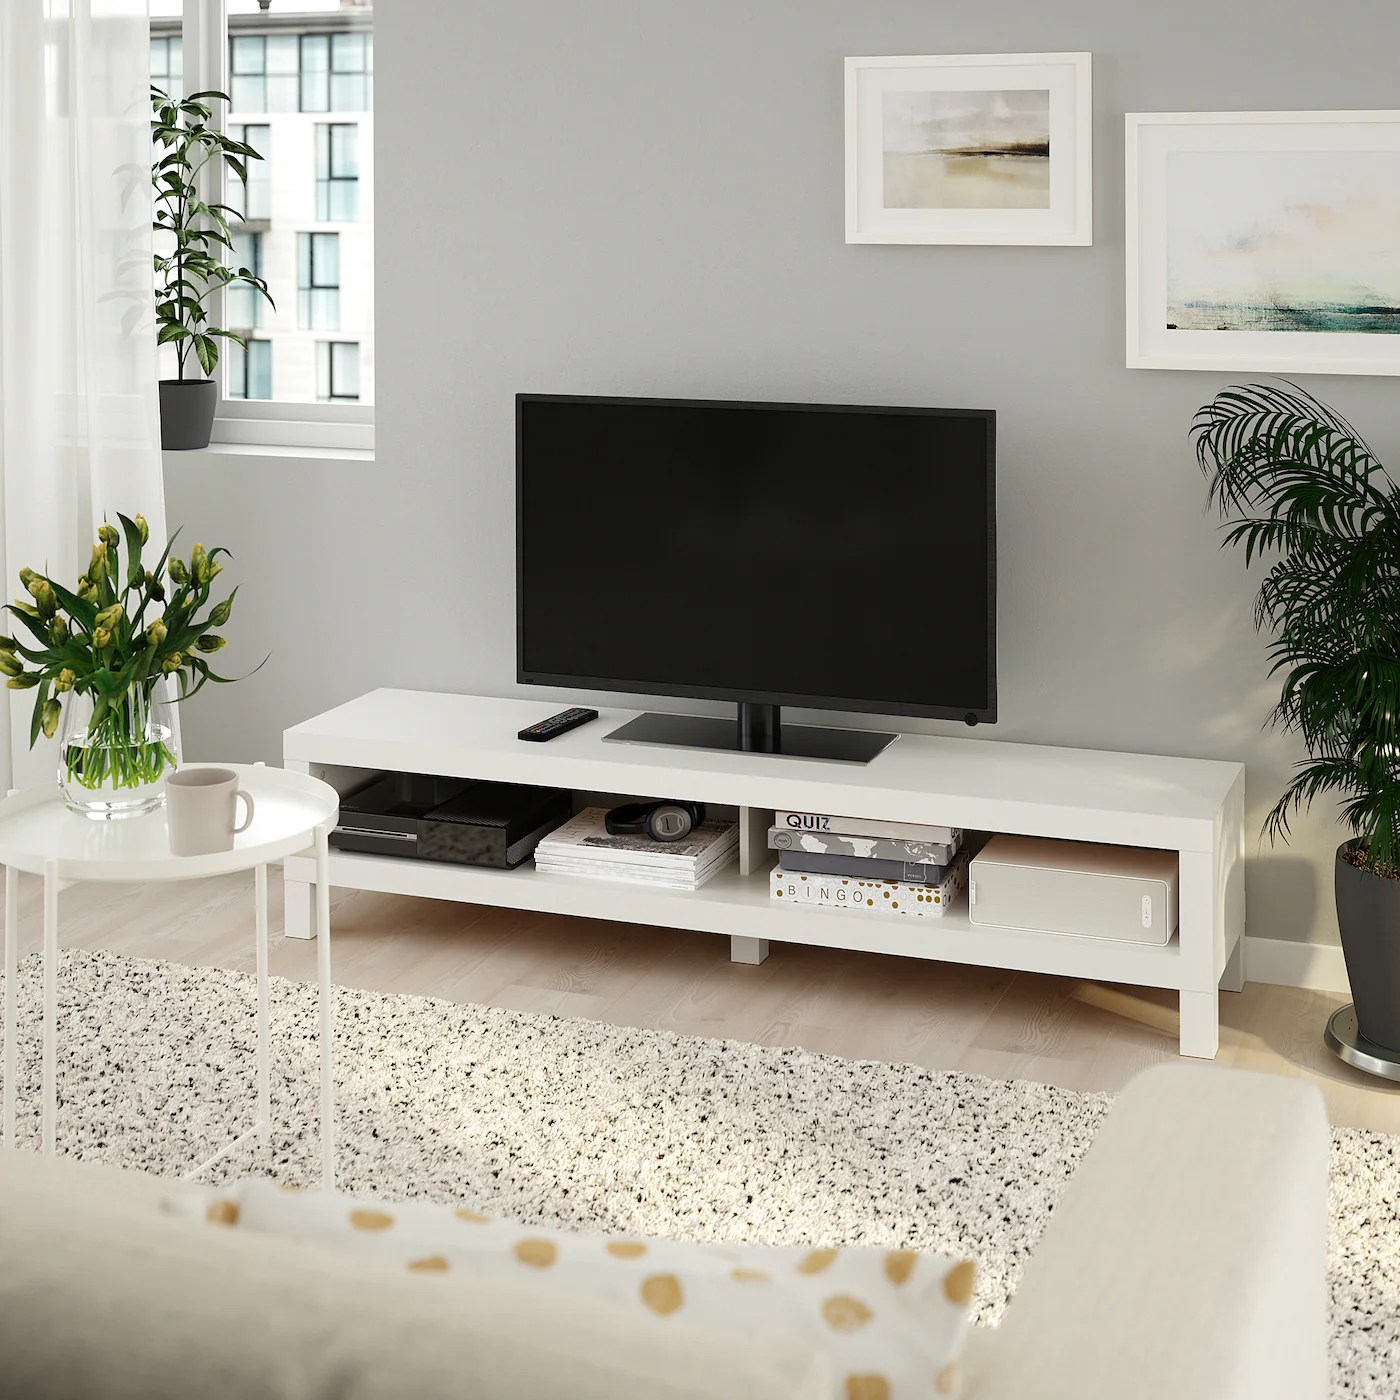 Lack Banc Tv Blanc 160x35x36 Cm Ikea